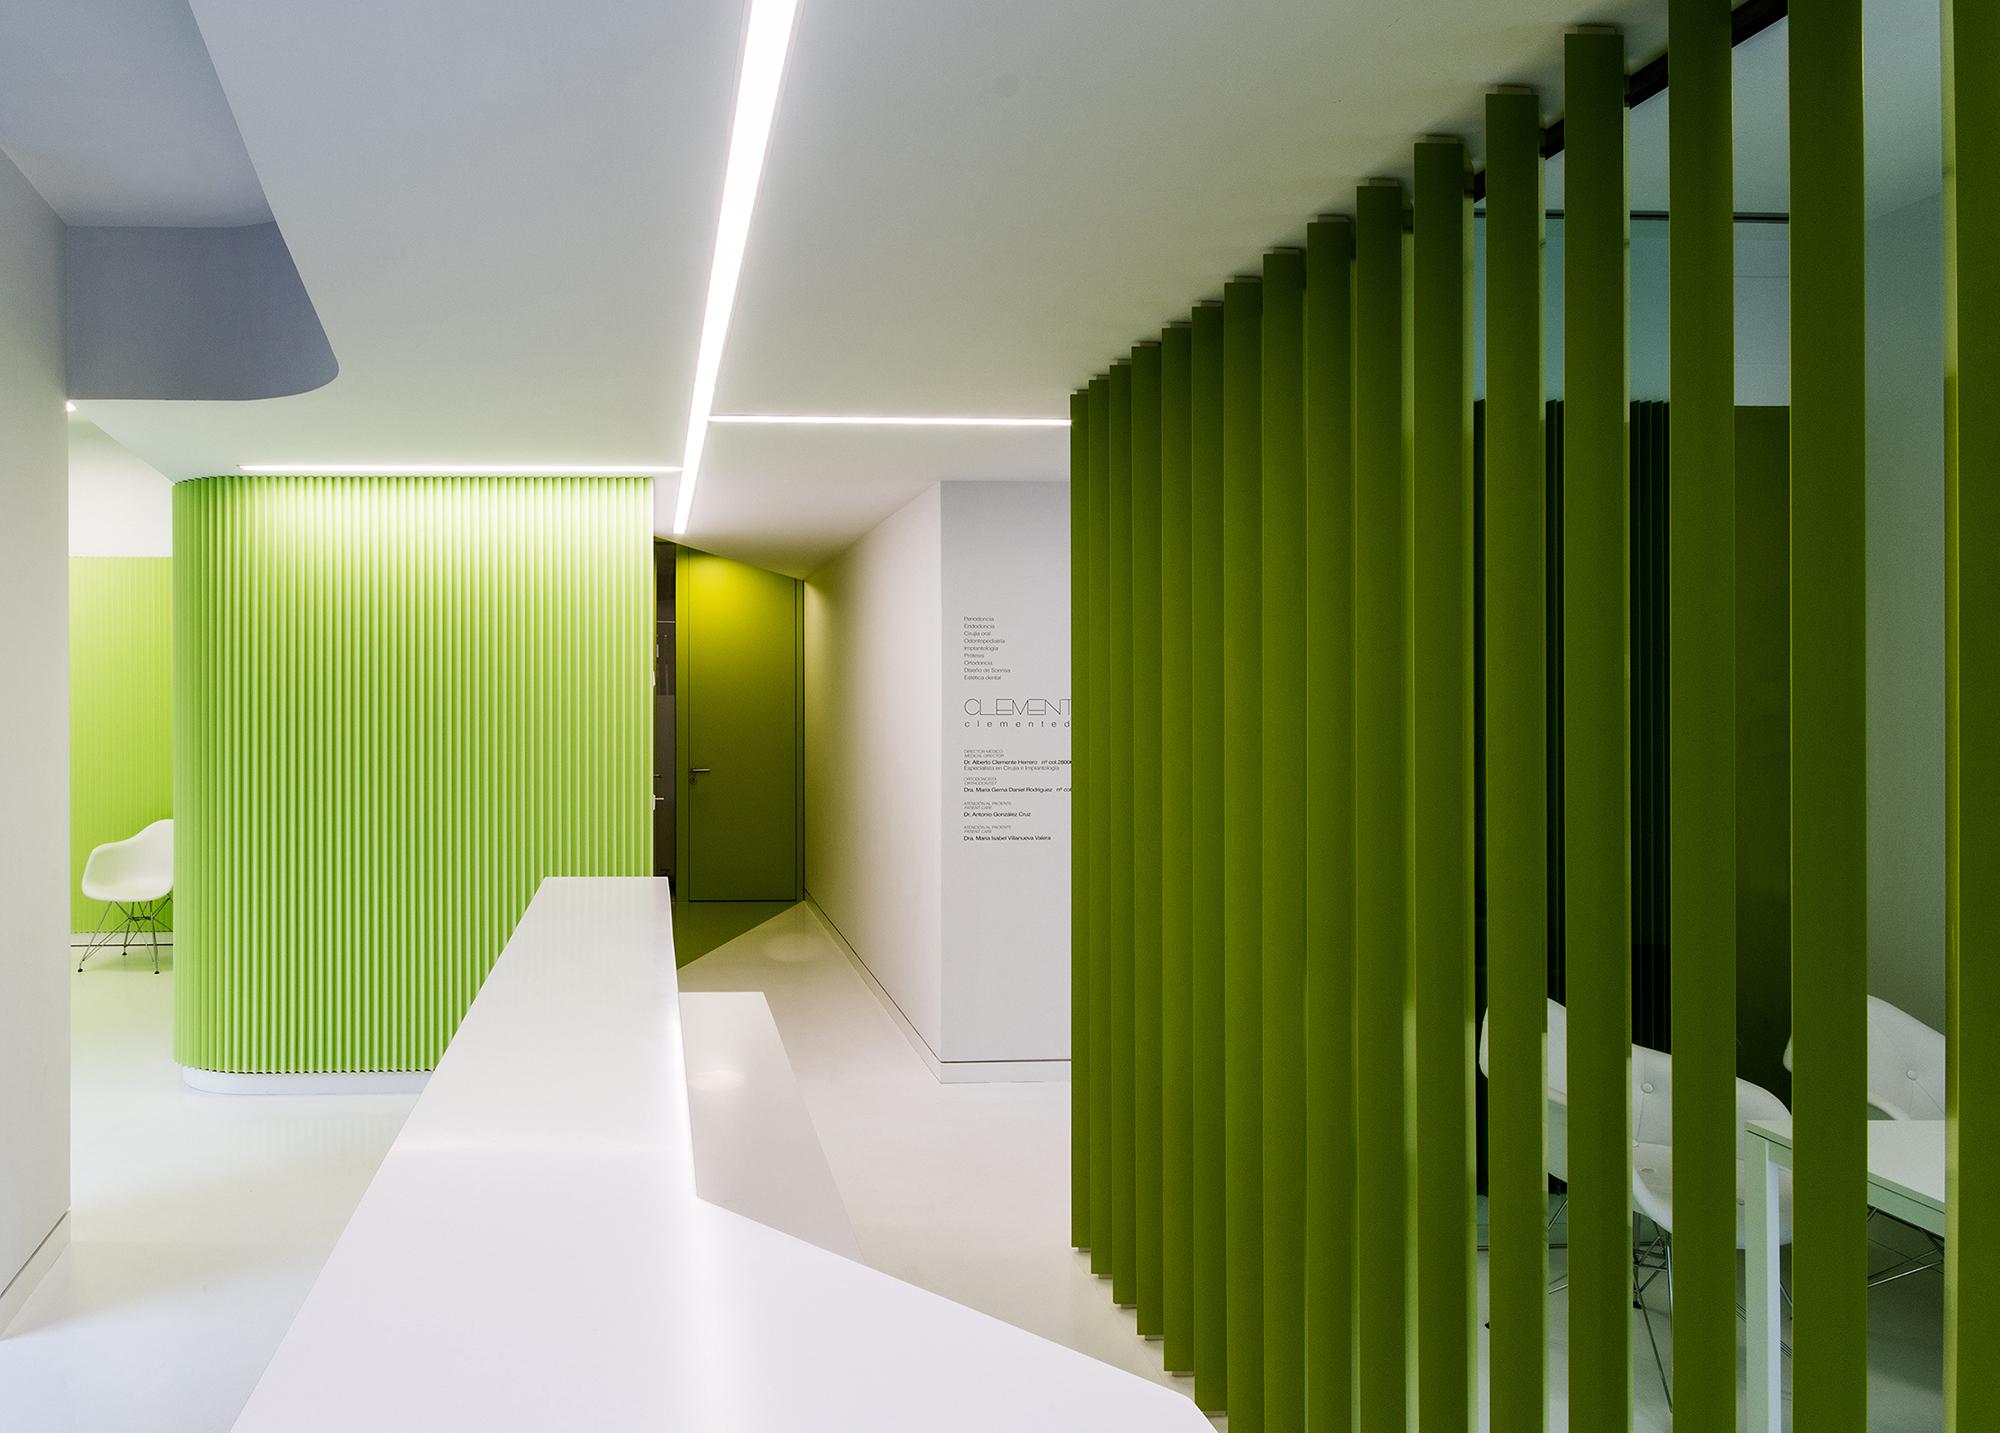 CLINICA CLEMENTE dental - LANDÍNEZ+REY arquitectos - arquitectura retail - interiorismo atencion al publico